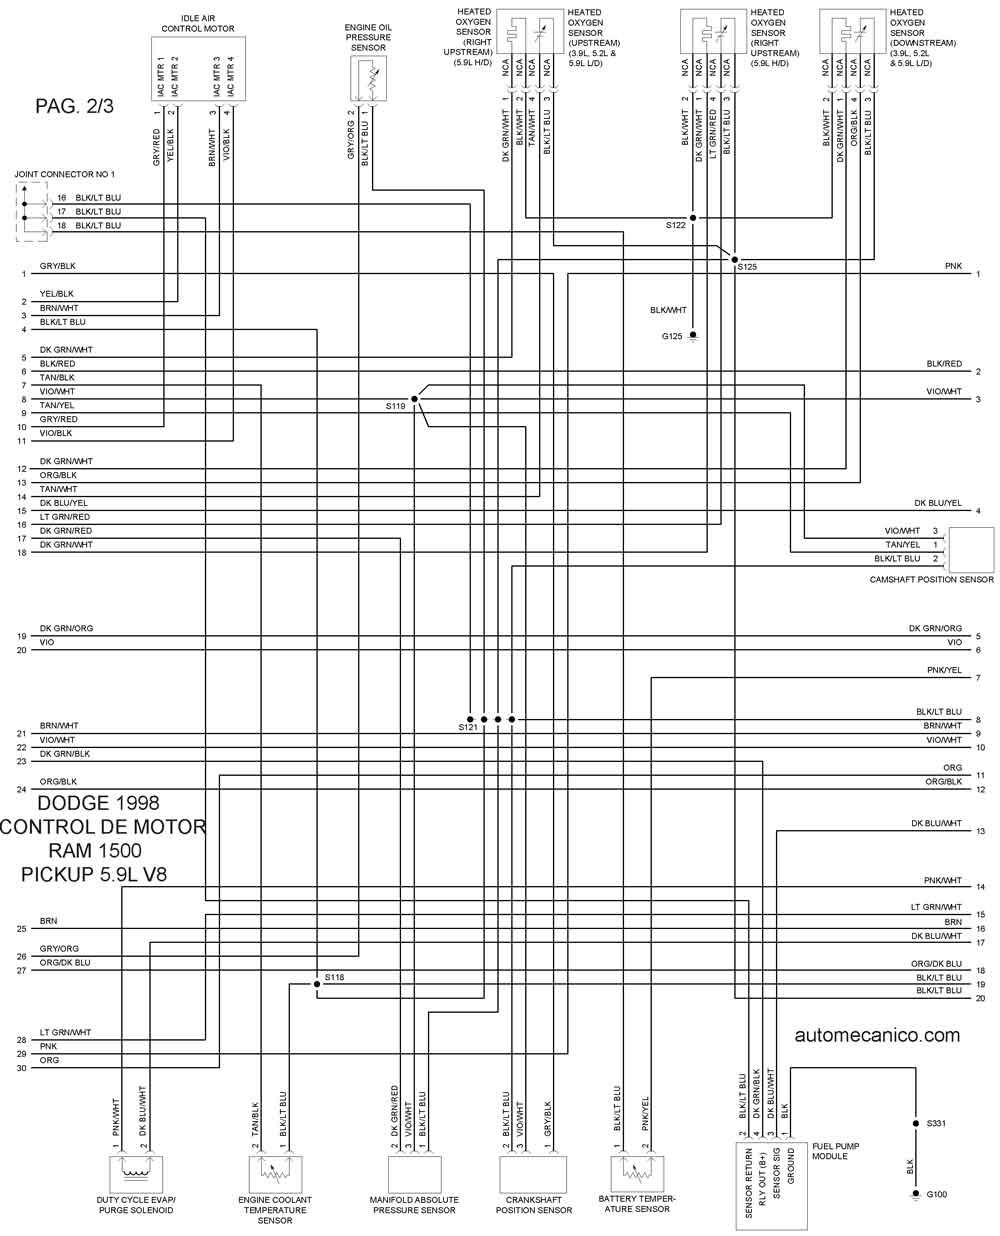 1998 dodge ram 1500 Diagrama del motor